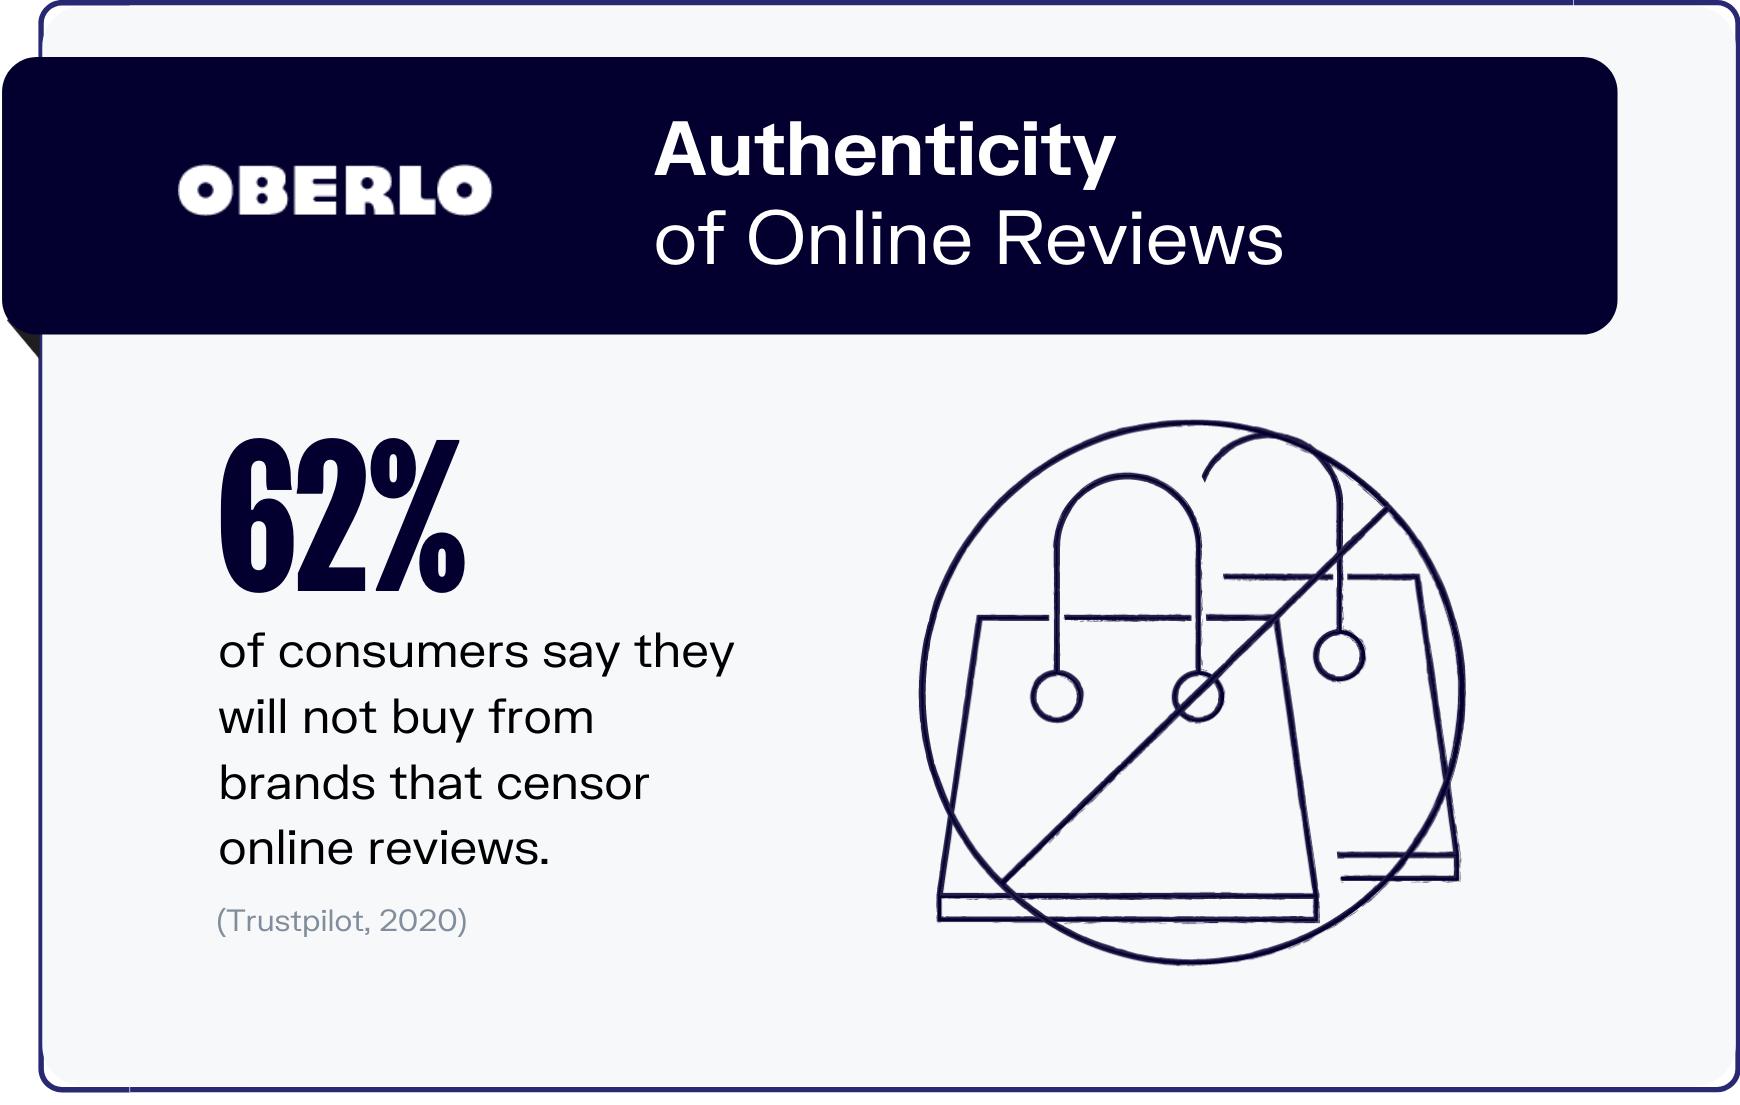 online reviews statistics graphic 2